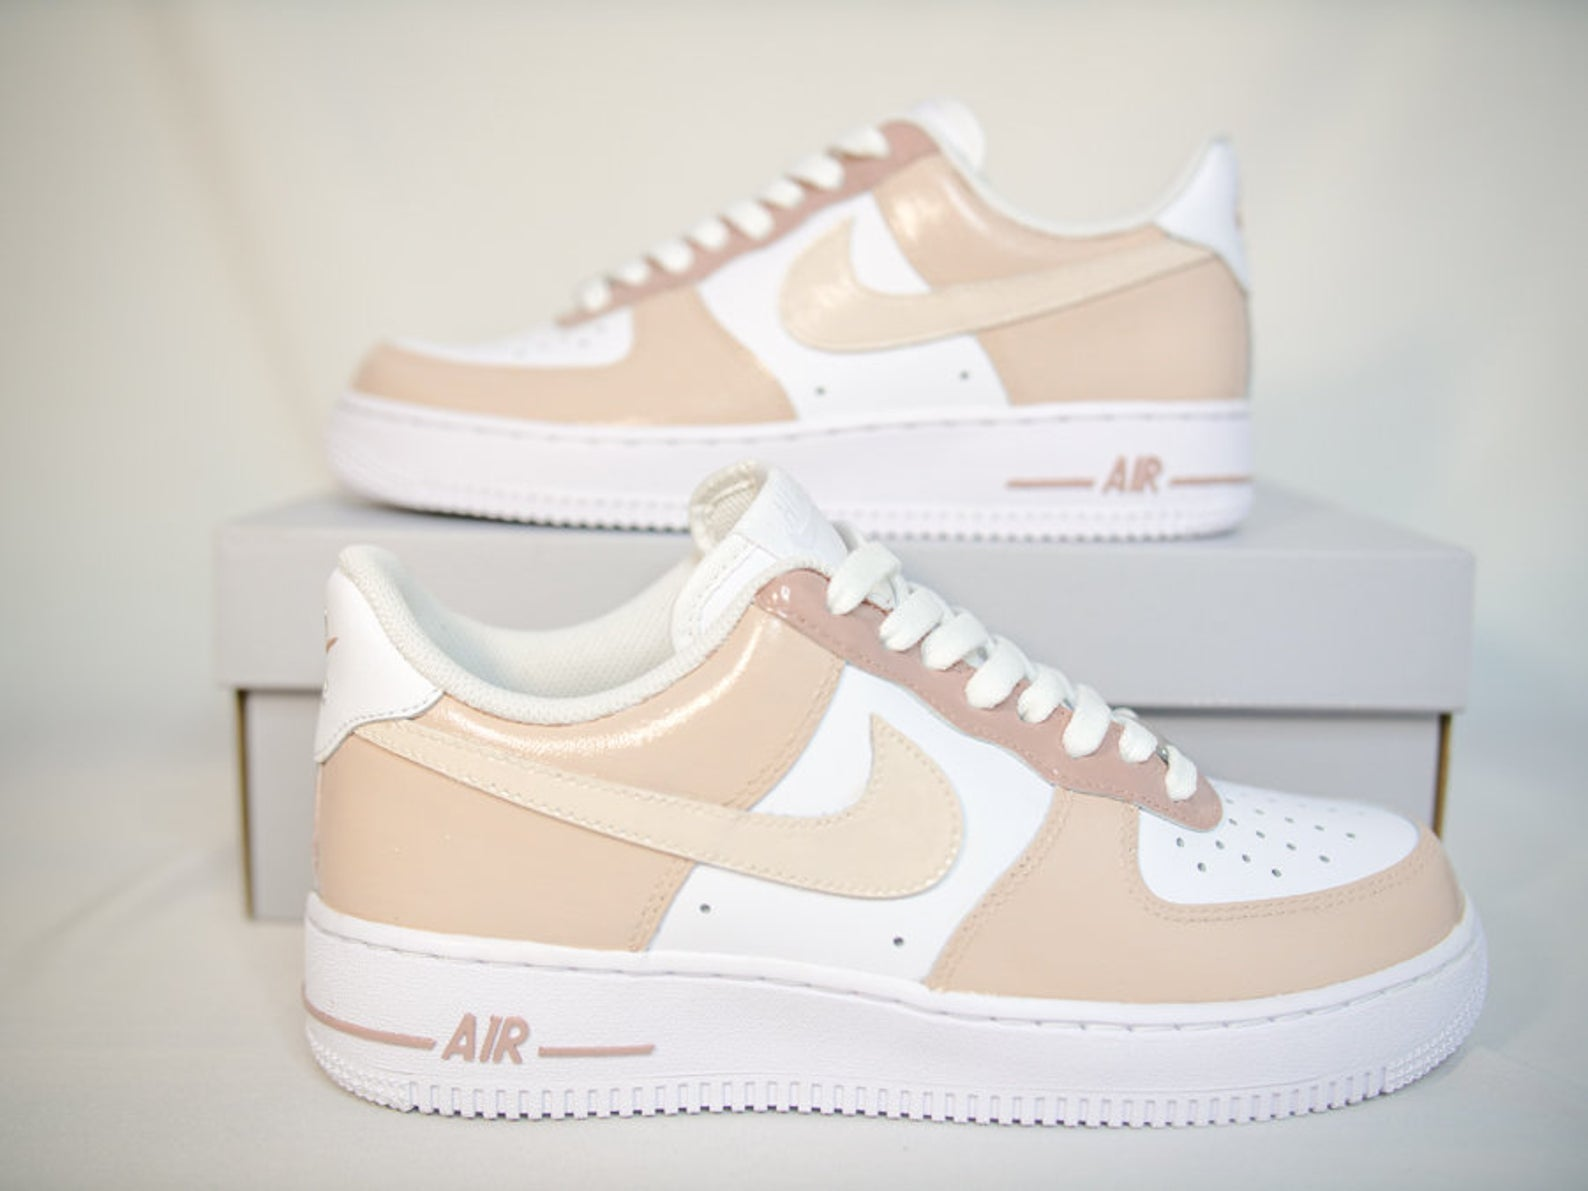 the custom sneaker custom kicks australia